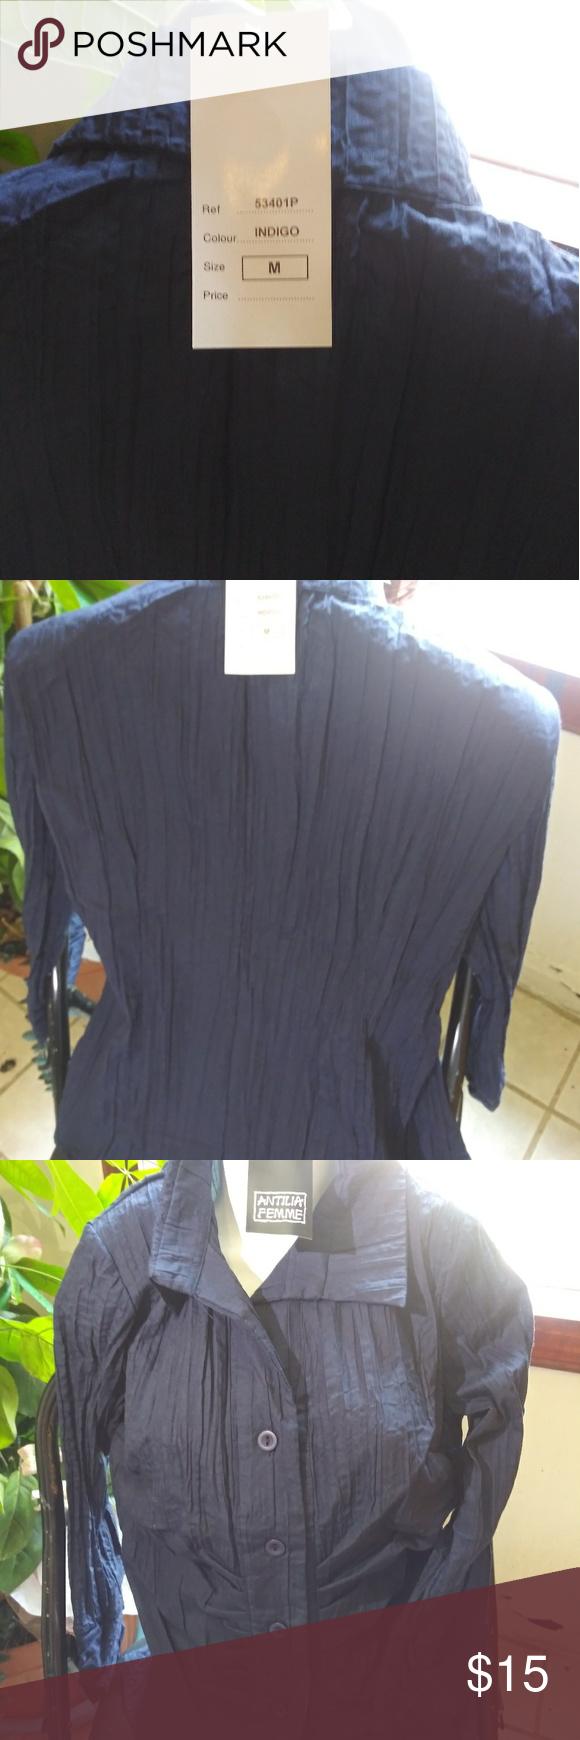 On Hold --Indigo Blue Pleated Blouse NWT Long sleeved pleated indigo deep blue ladies blouse with some stretch to it, perfect with summer whites, skirt, shorts, or white slacks. NWT Atillia Femme Other #whiteslacks